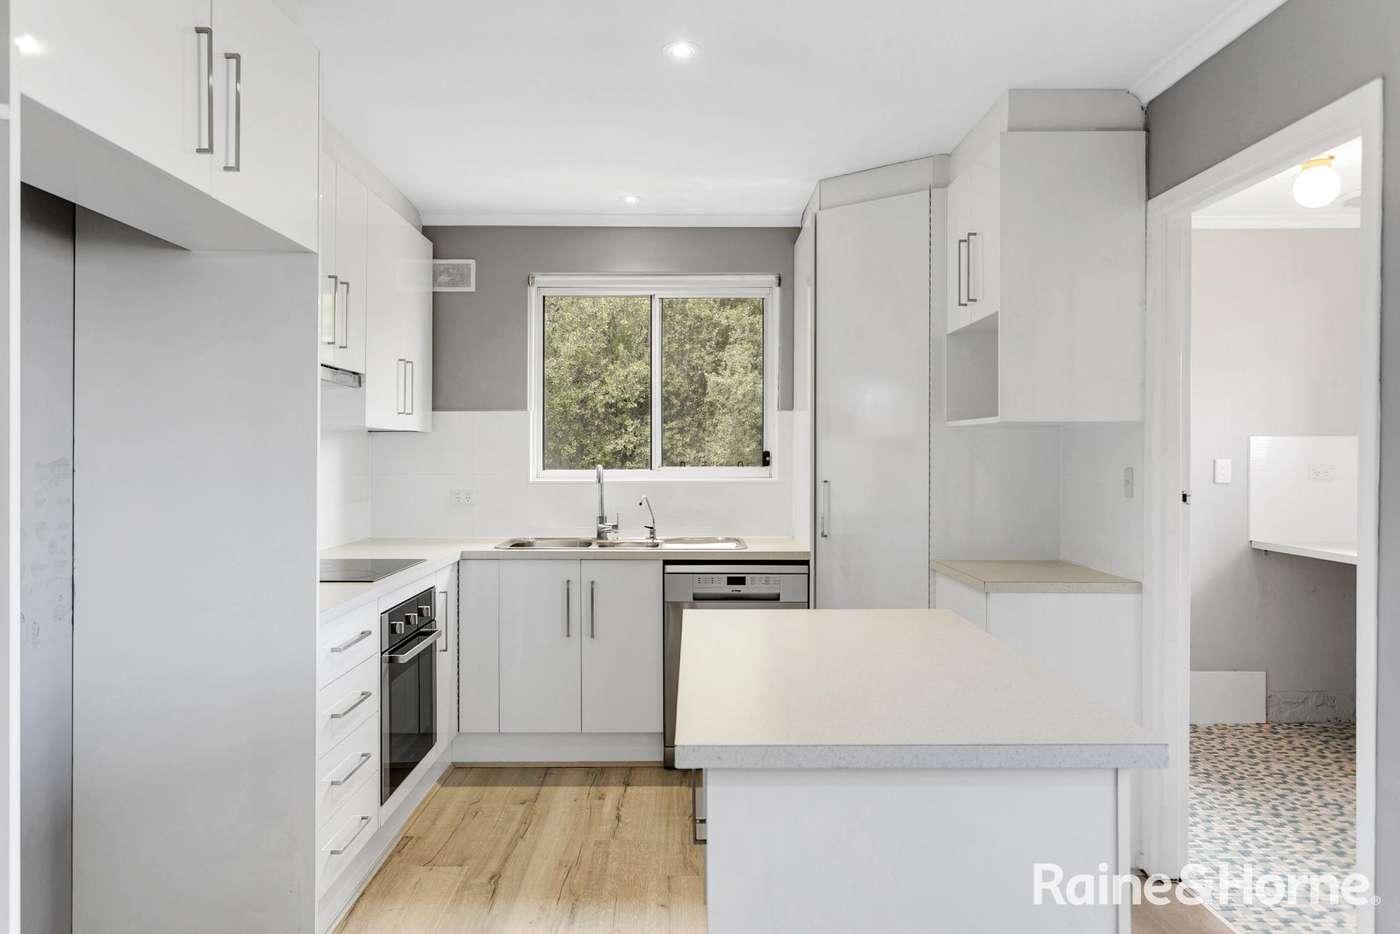 Main view of Homely house listing, 8 Pinchbeck Street, Morphett Vale SA 5162